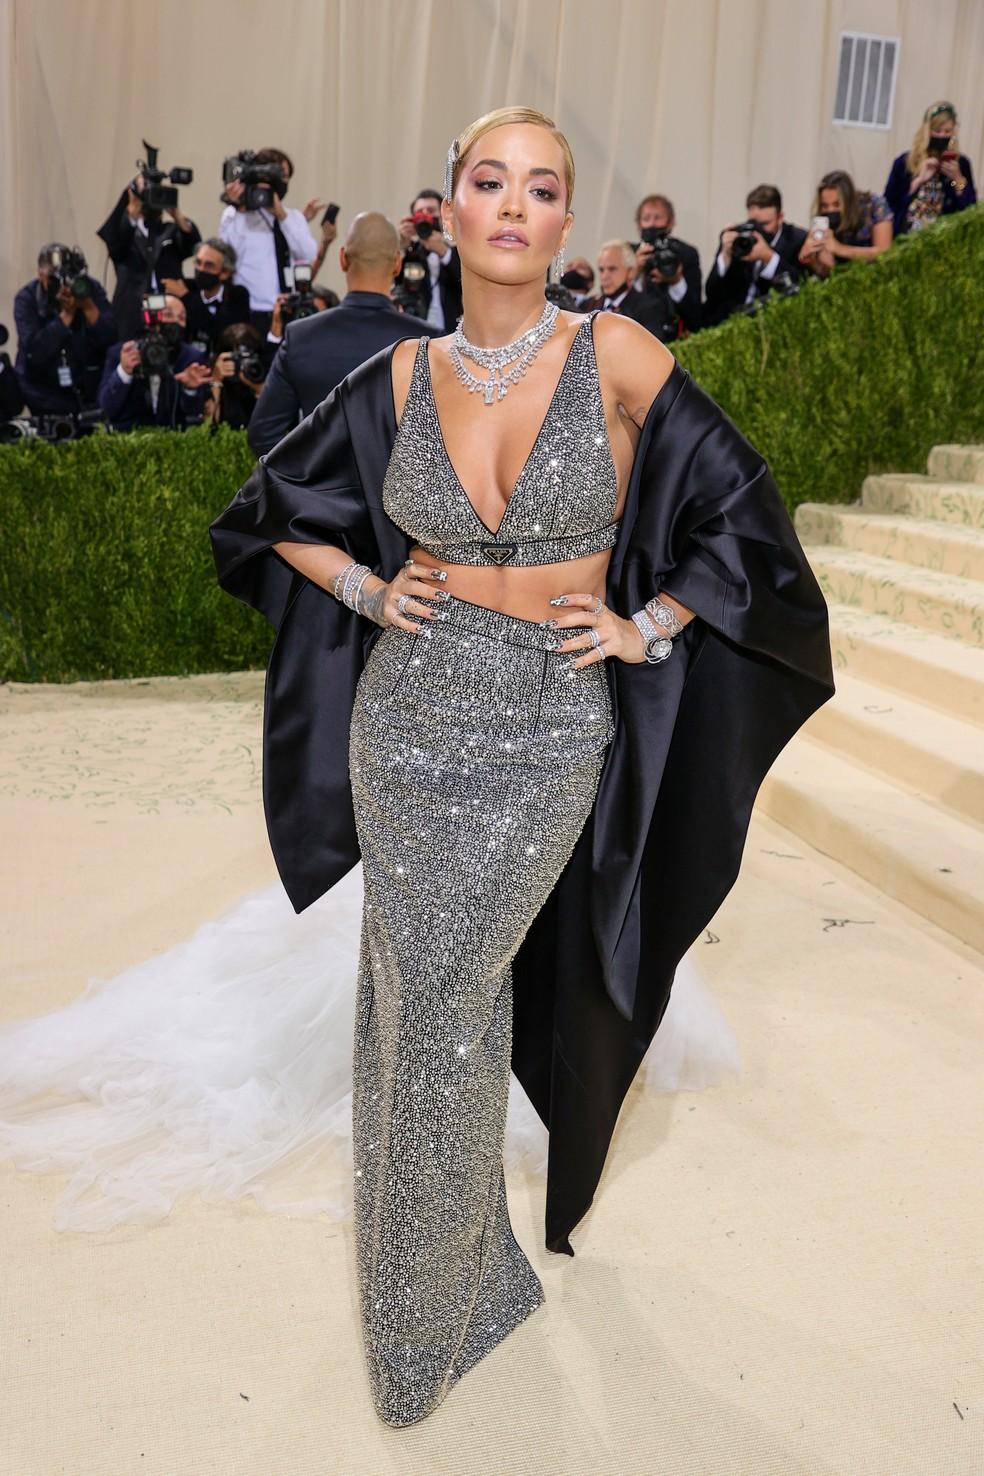 Rita Ora no Met Gala 2021 — Foto: Theo Wargo/Getty Images